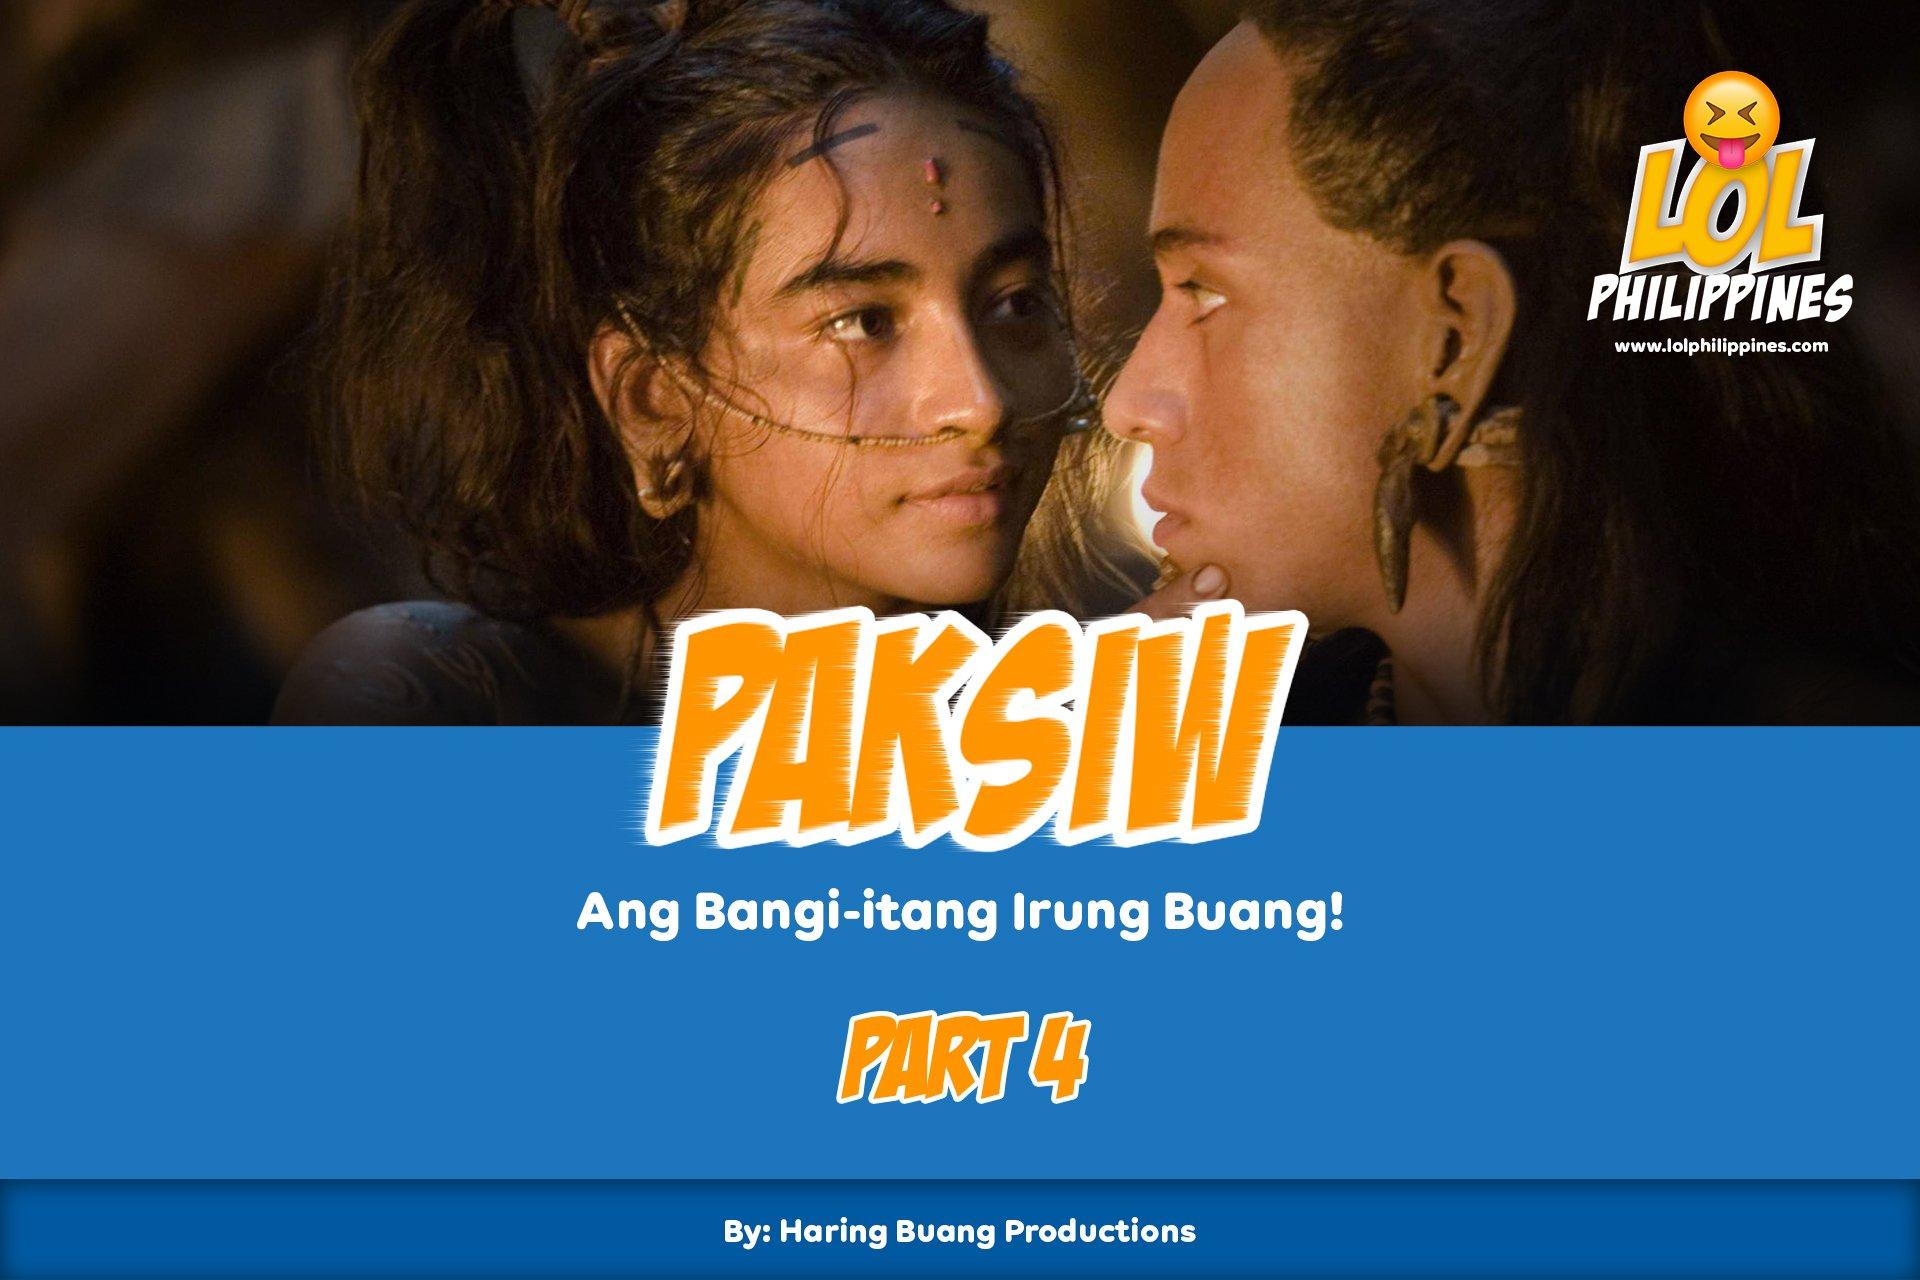 LOL Philippines Paksiw Part 4